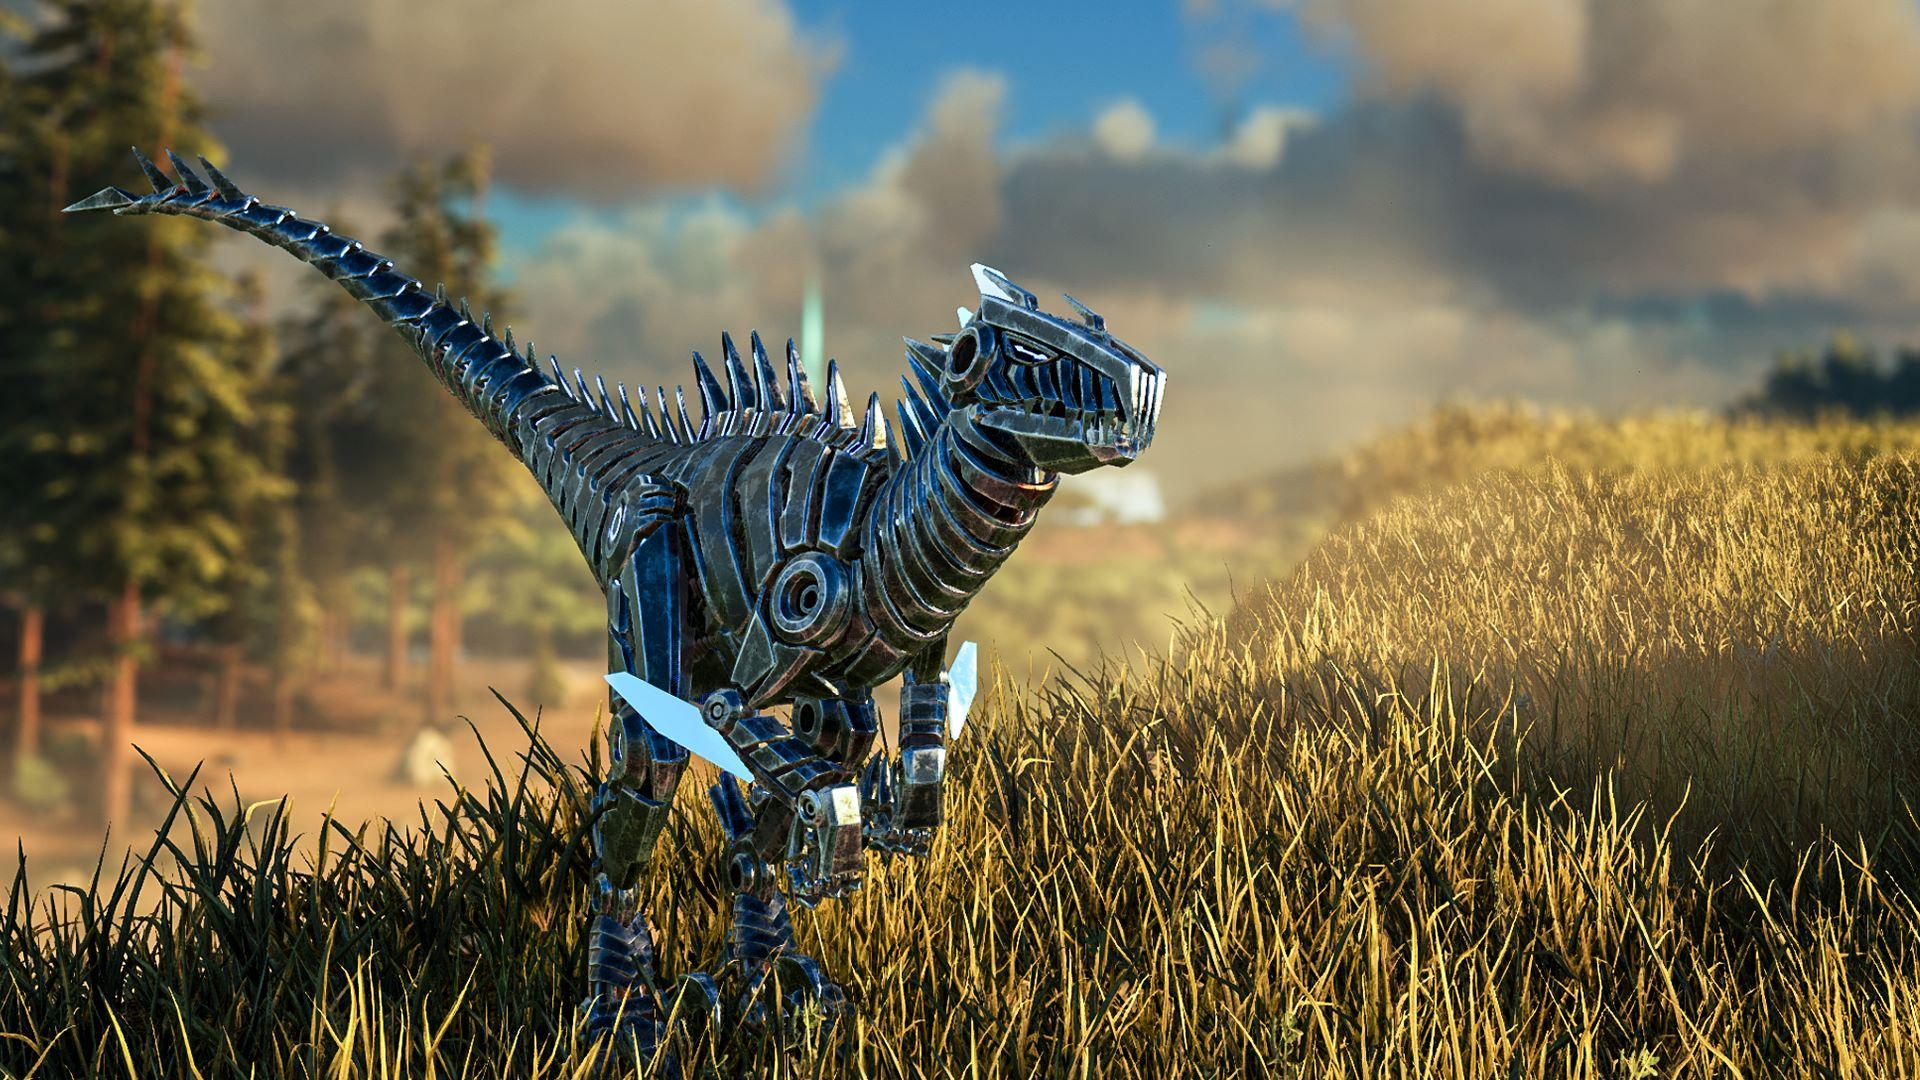 Buy Ark Survival Evolved Bionic Raptor Skin Microsoft Store En Ca